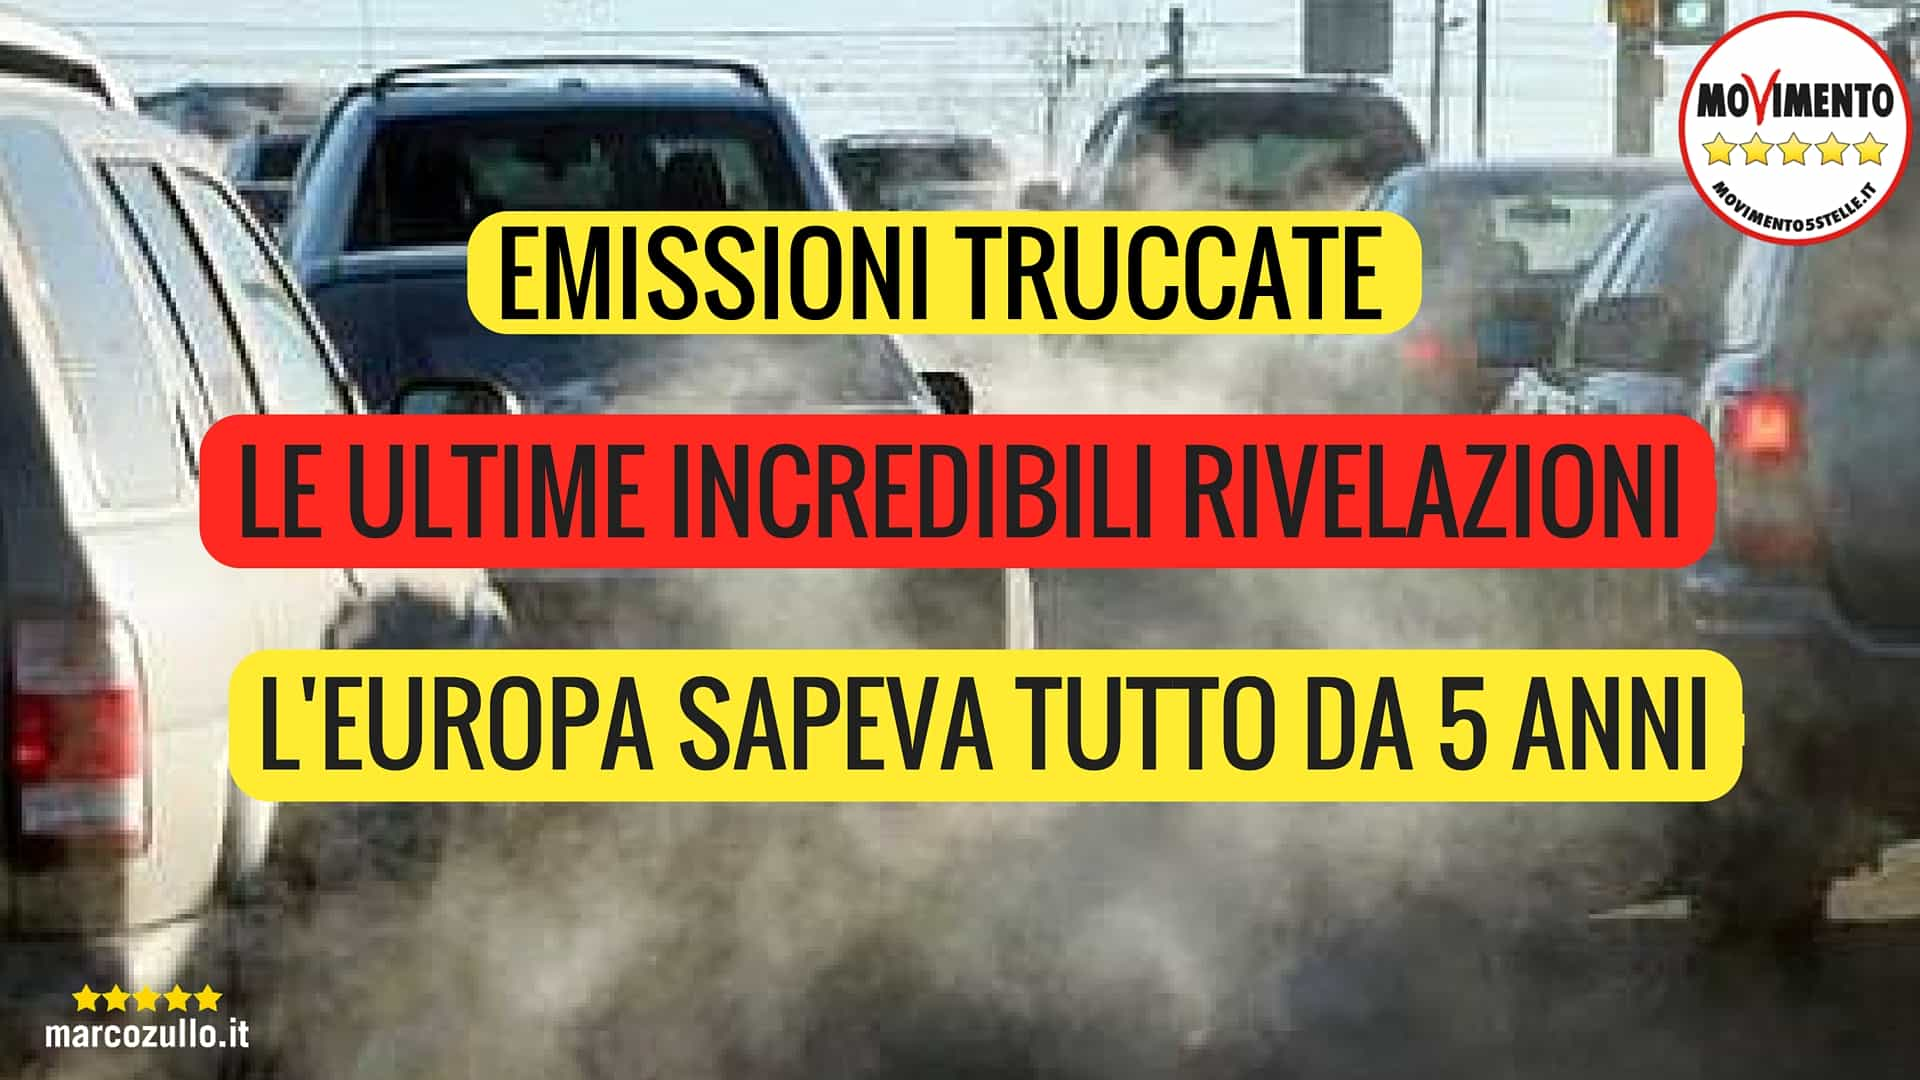 Marco Zullo M5S Europa emissioni truccate dieselgate volkswagen